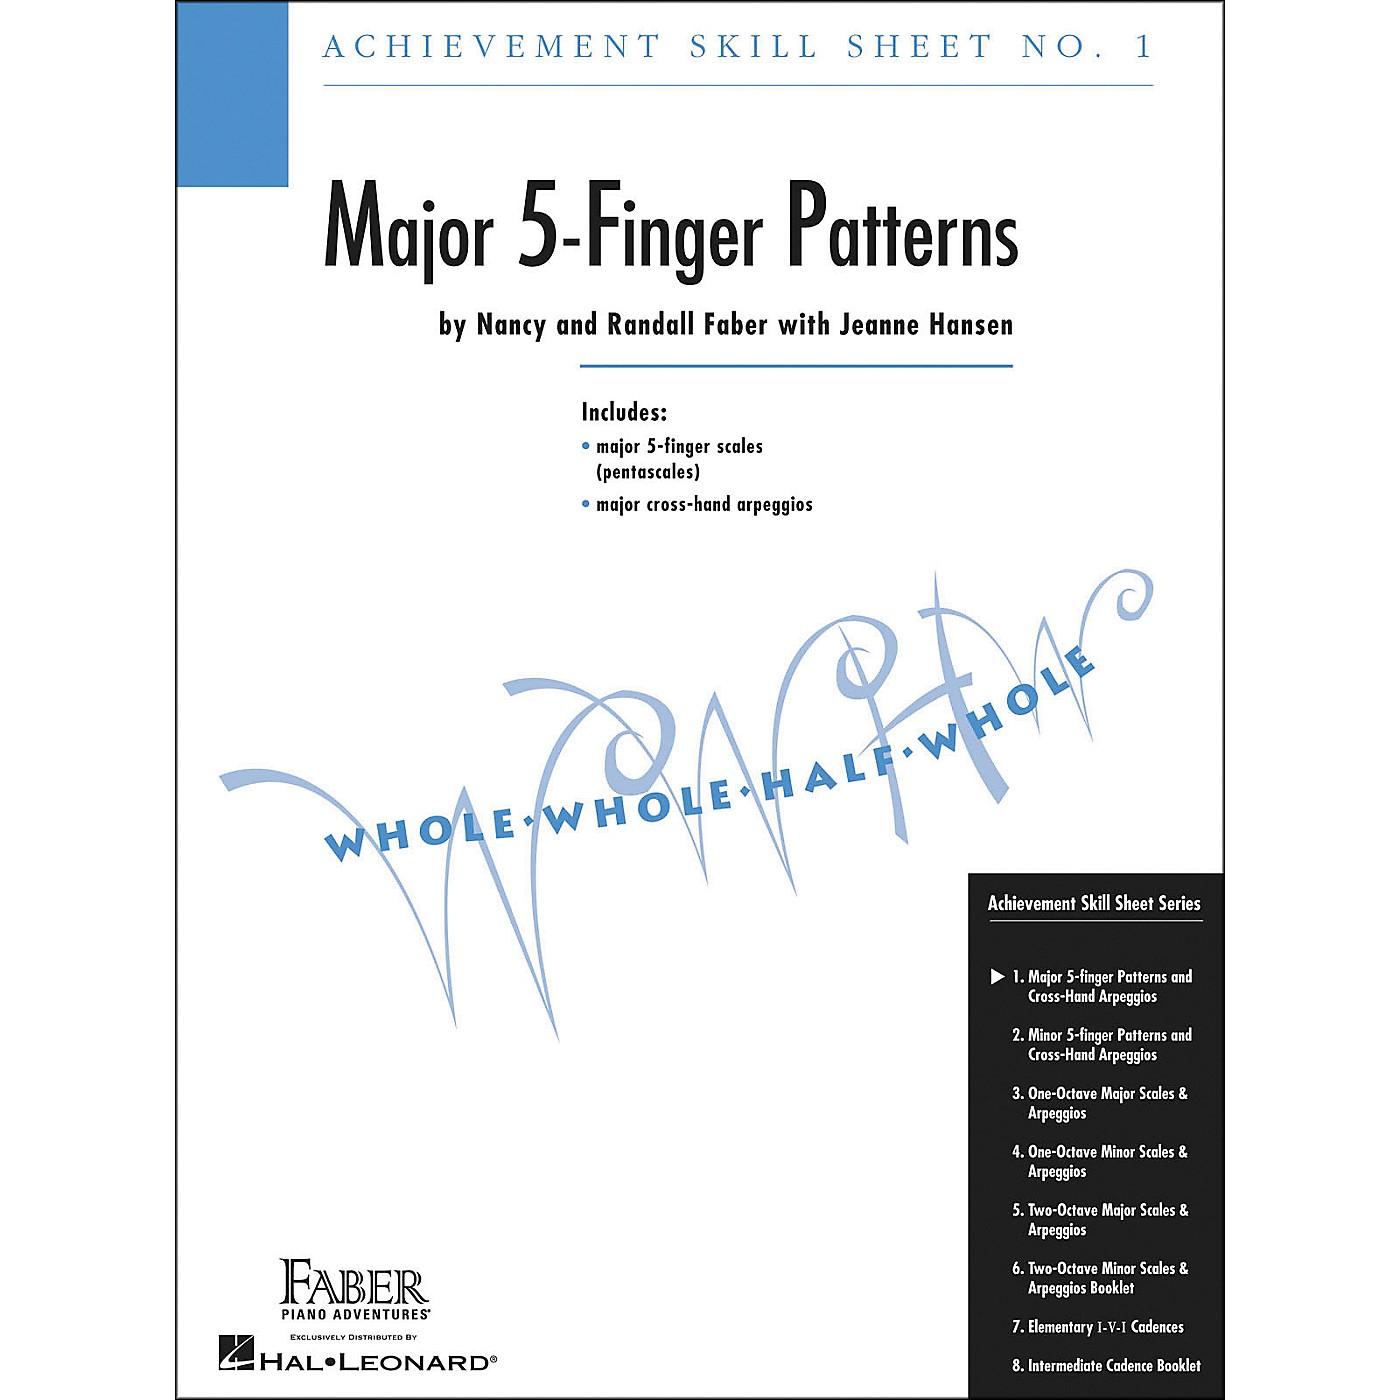 Faber Piano Adventures Achievement Skill Sheet No.1: Major 5-Finger Patterns - Faber Piano thumbnail